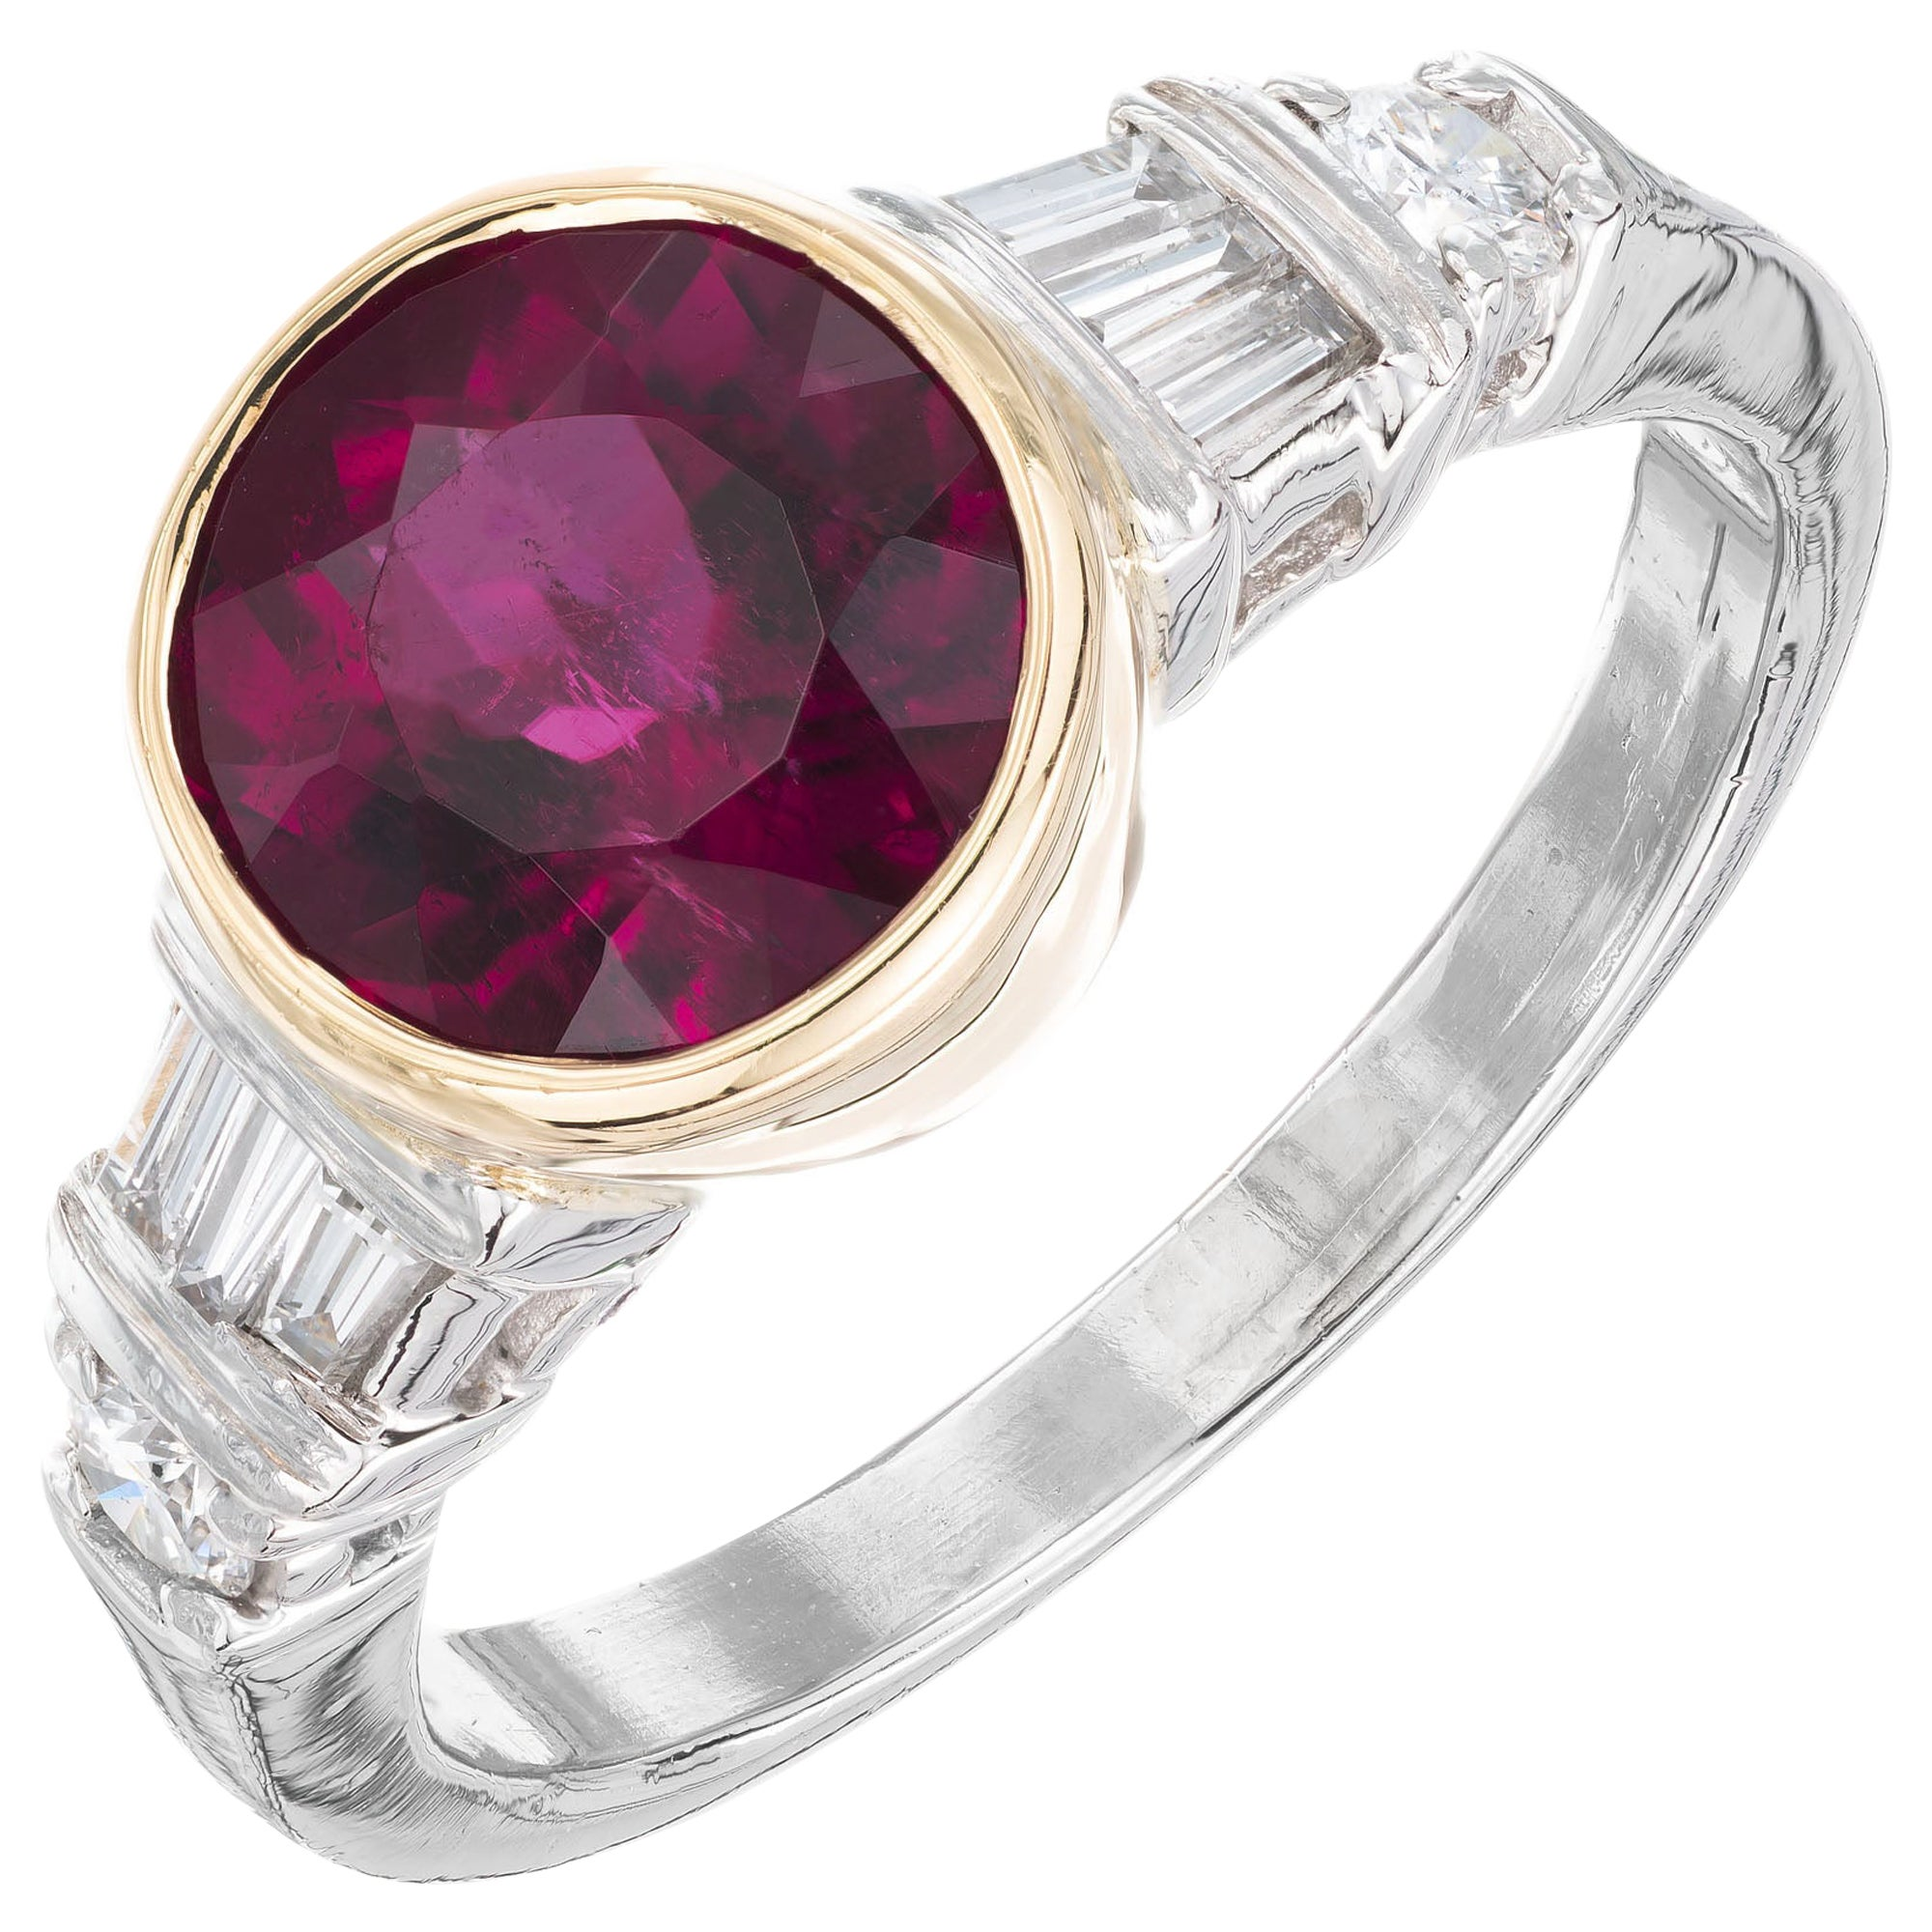 2.04 Carat Red Tourmaline Diamond Platinum Engagement Ring